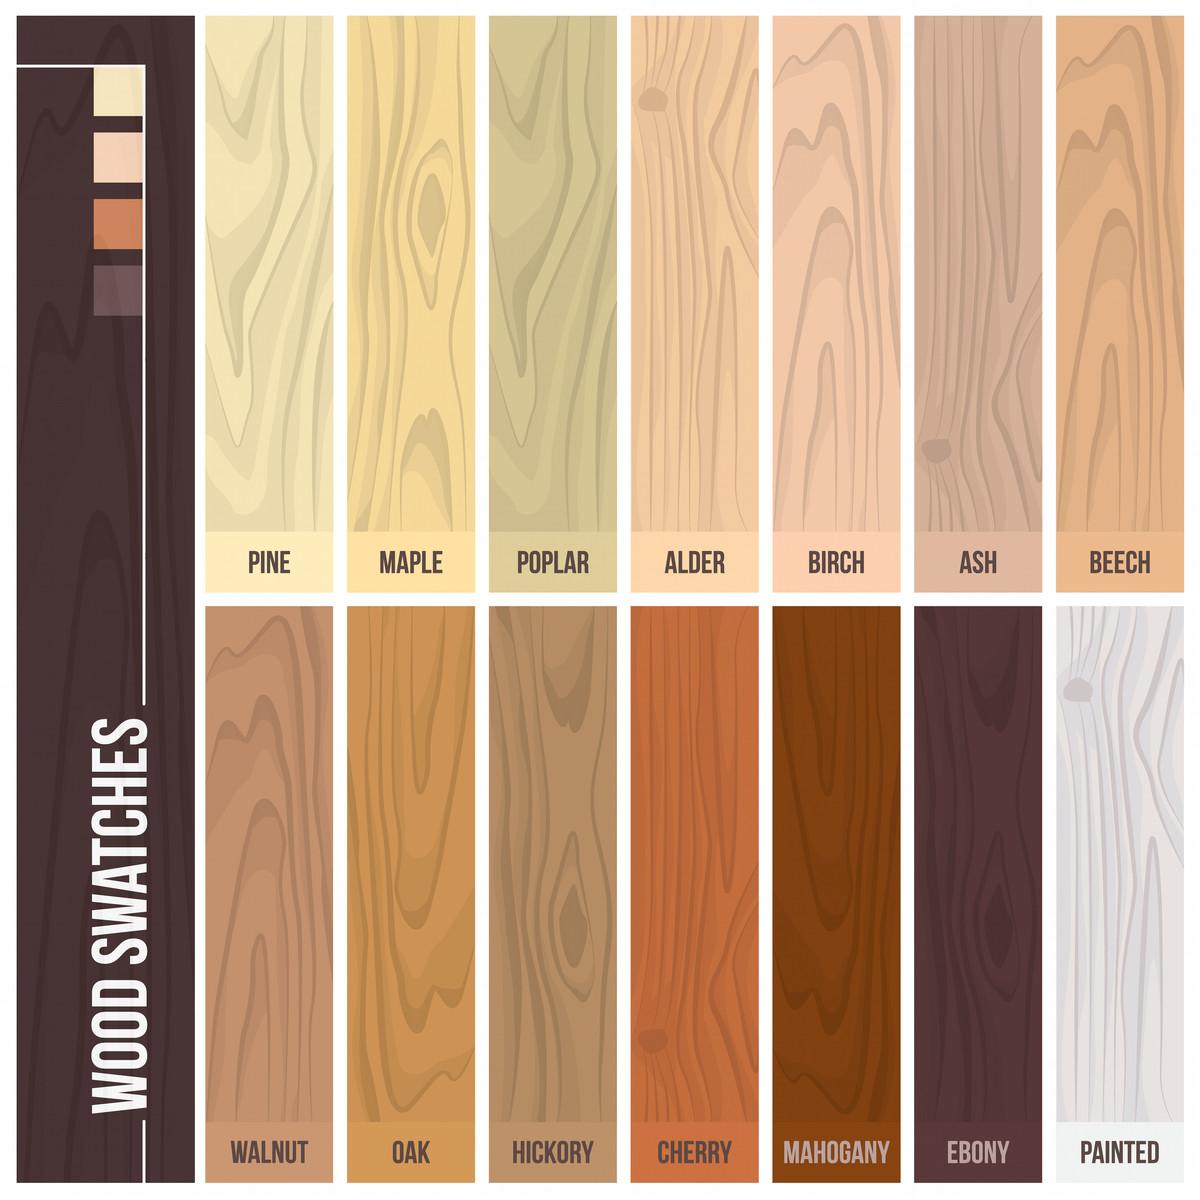 hardwood floor cleaner for scratches of 12 types of hardwood flooring species styles edging dimensions for types of hardwood flooring illustrated guide